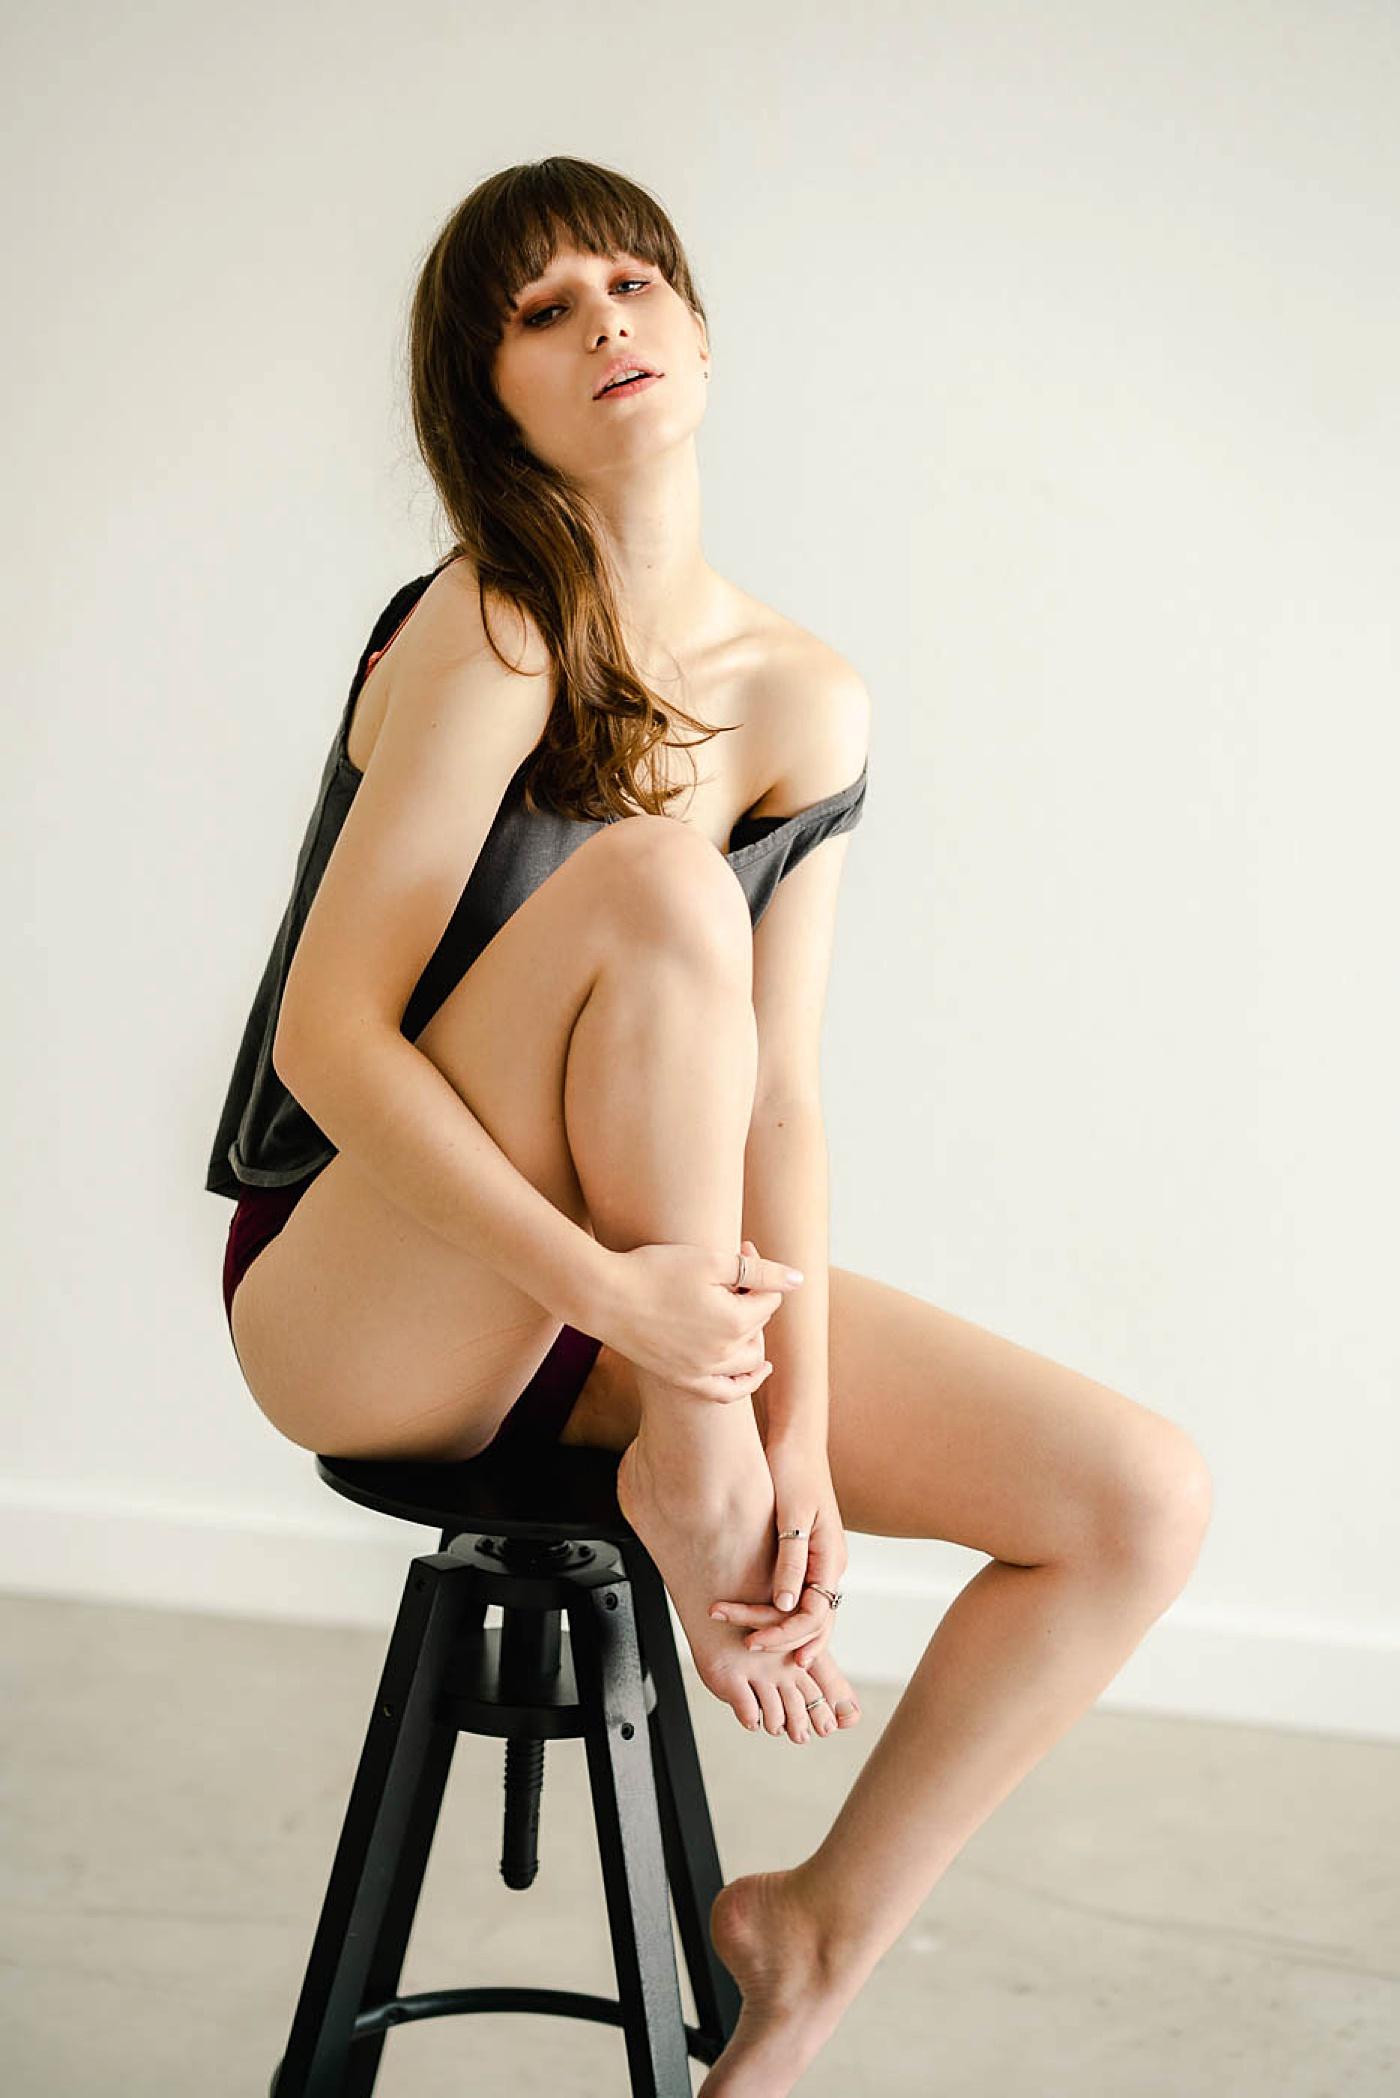 modest_boudoir_photography_austin_tx_0512.jpg